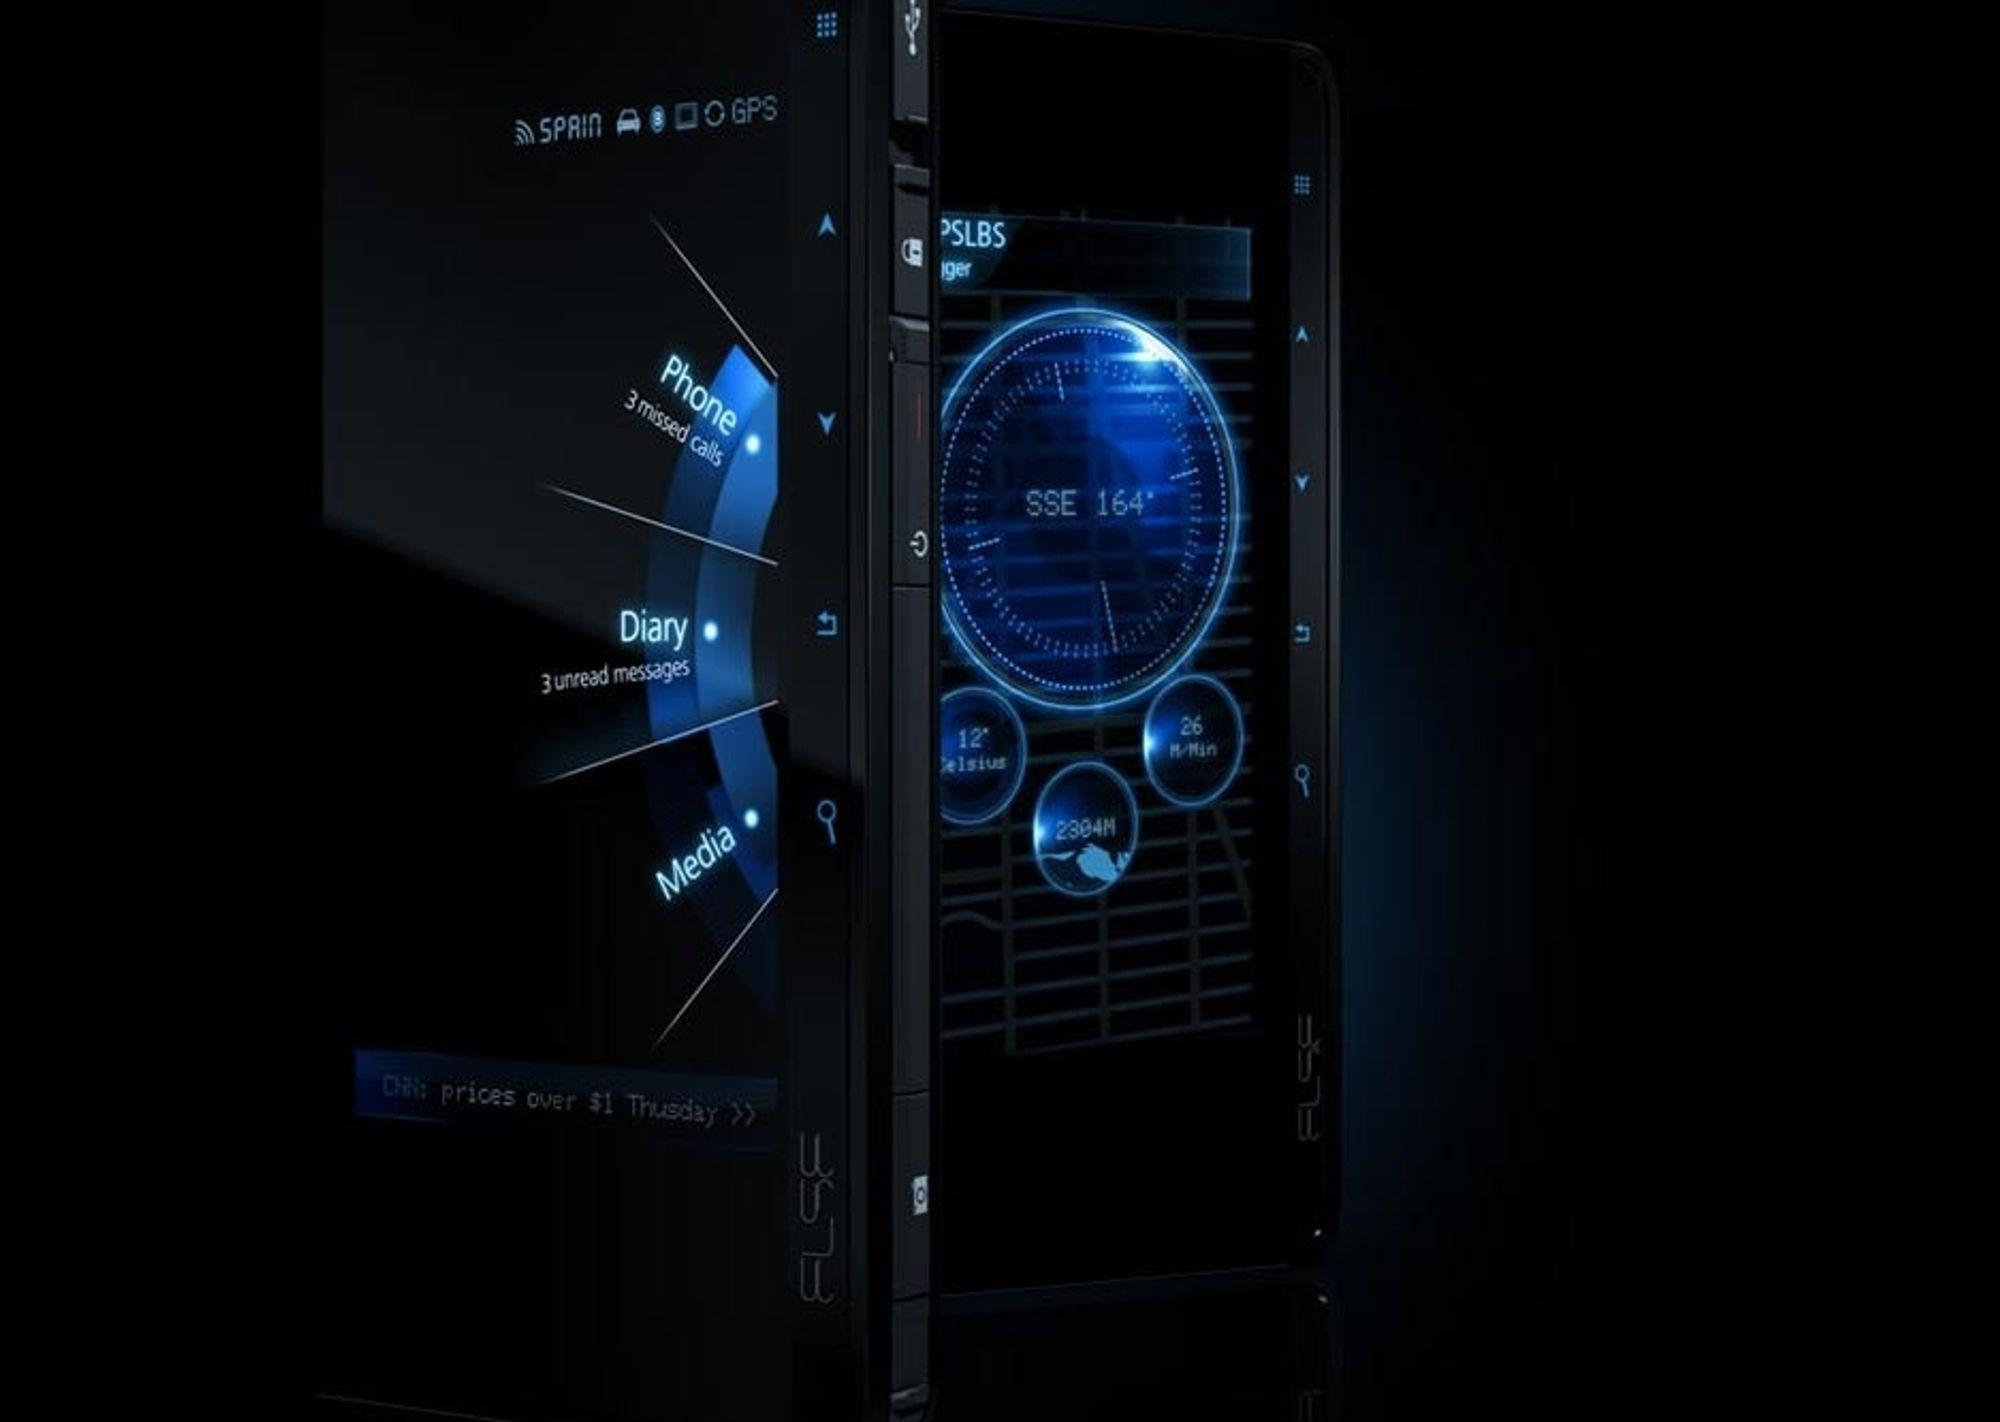 Nytt operativsystem for mobiltelefoner